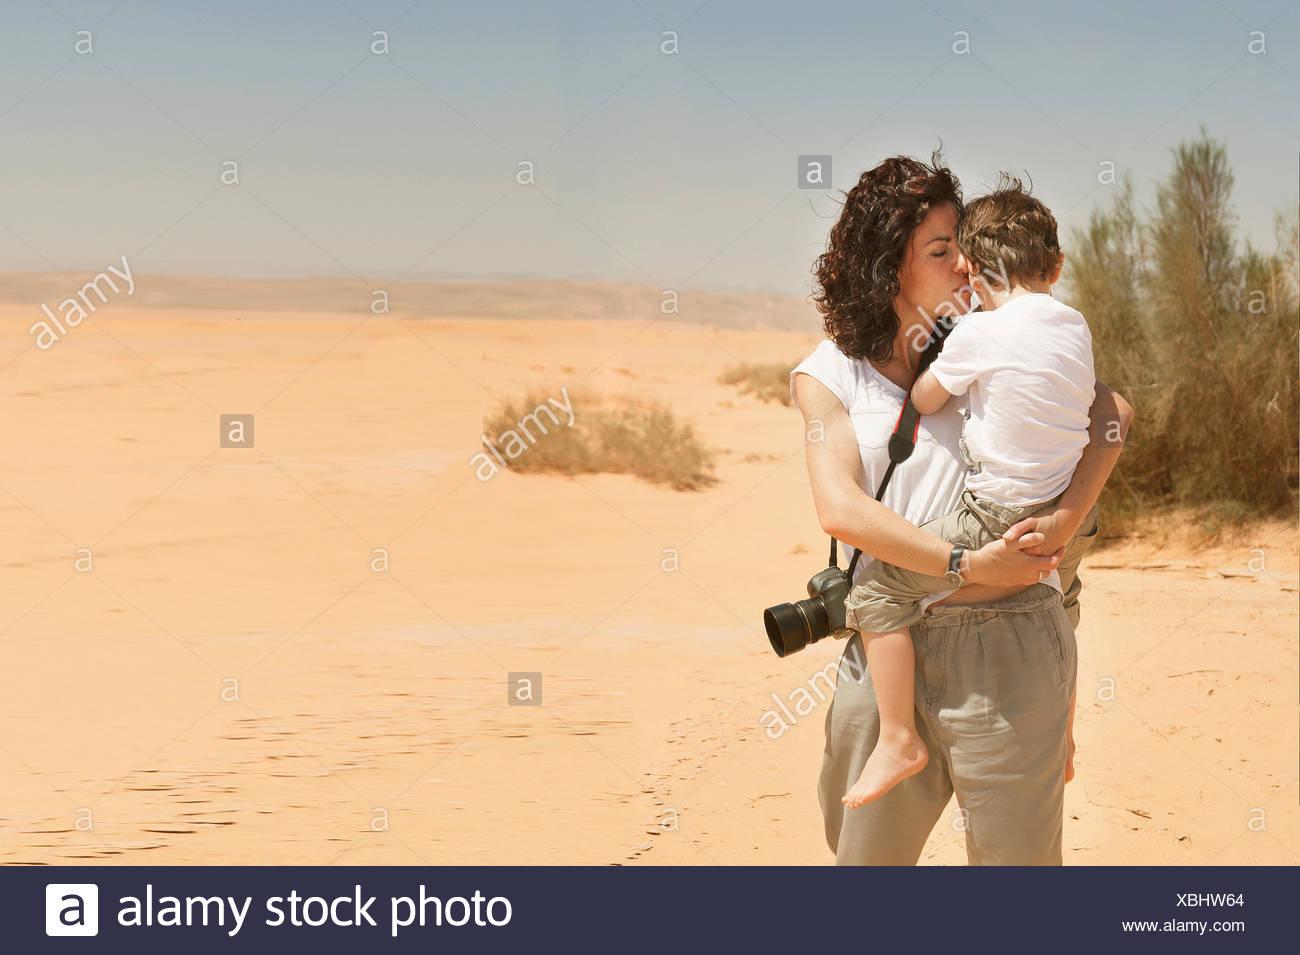 Mother standing in desert carrying her son, Jordan Stock Photo